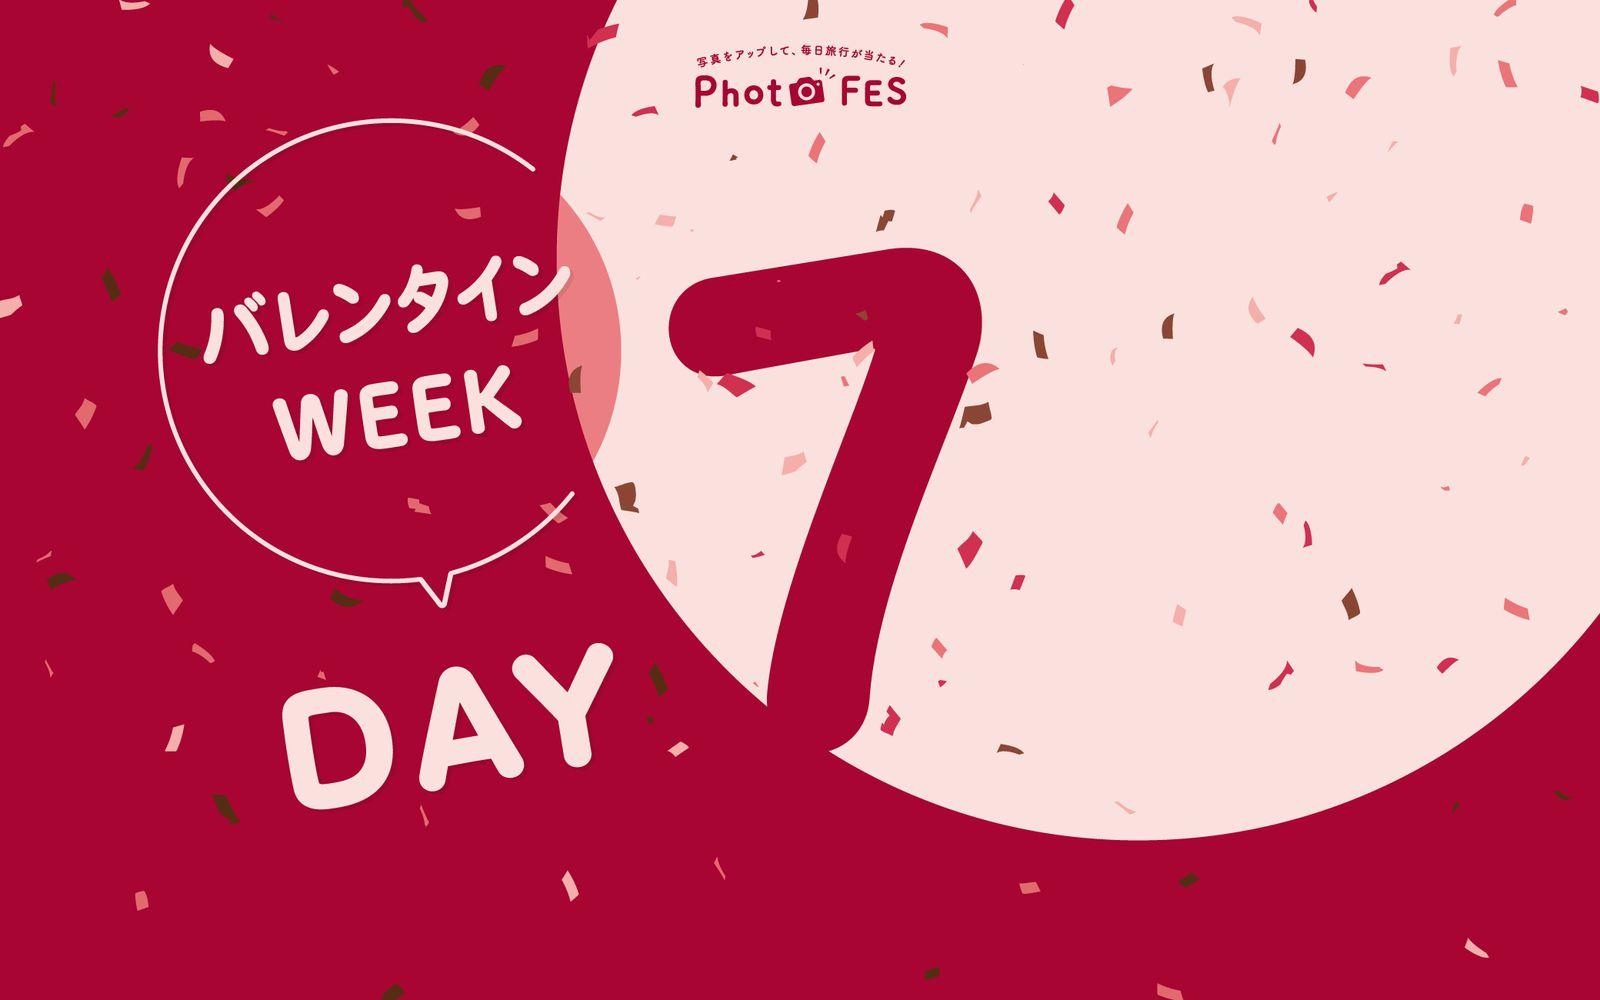 【DAY7】「Photo FES バレンタインWEEK」2月7日投稿分であたる賞品&受賞者発表